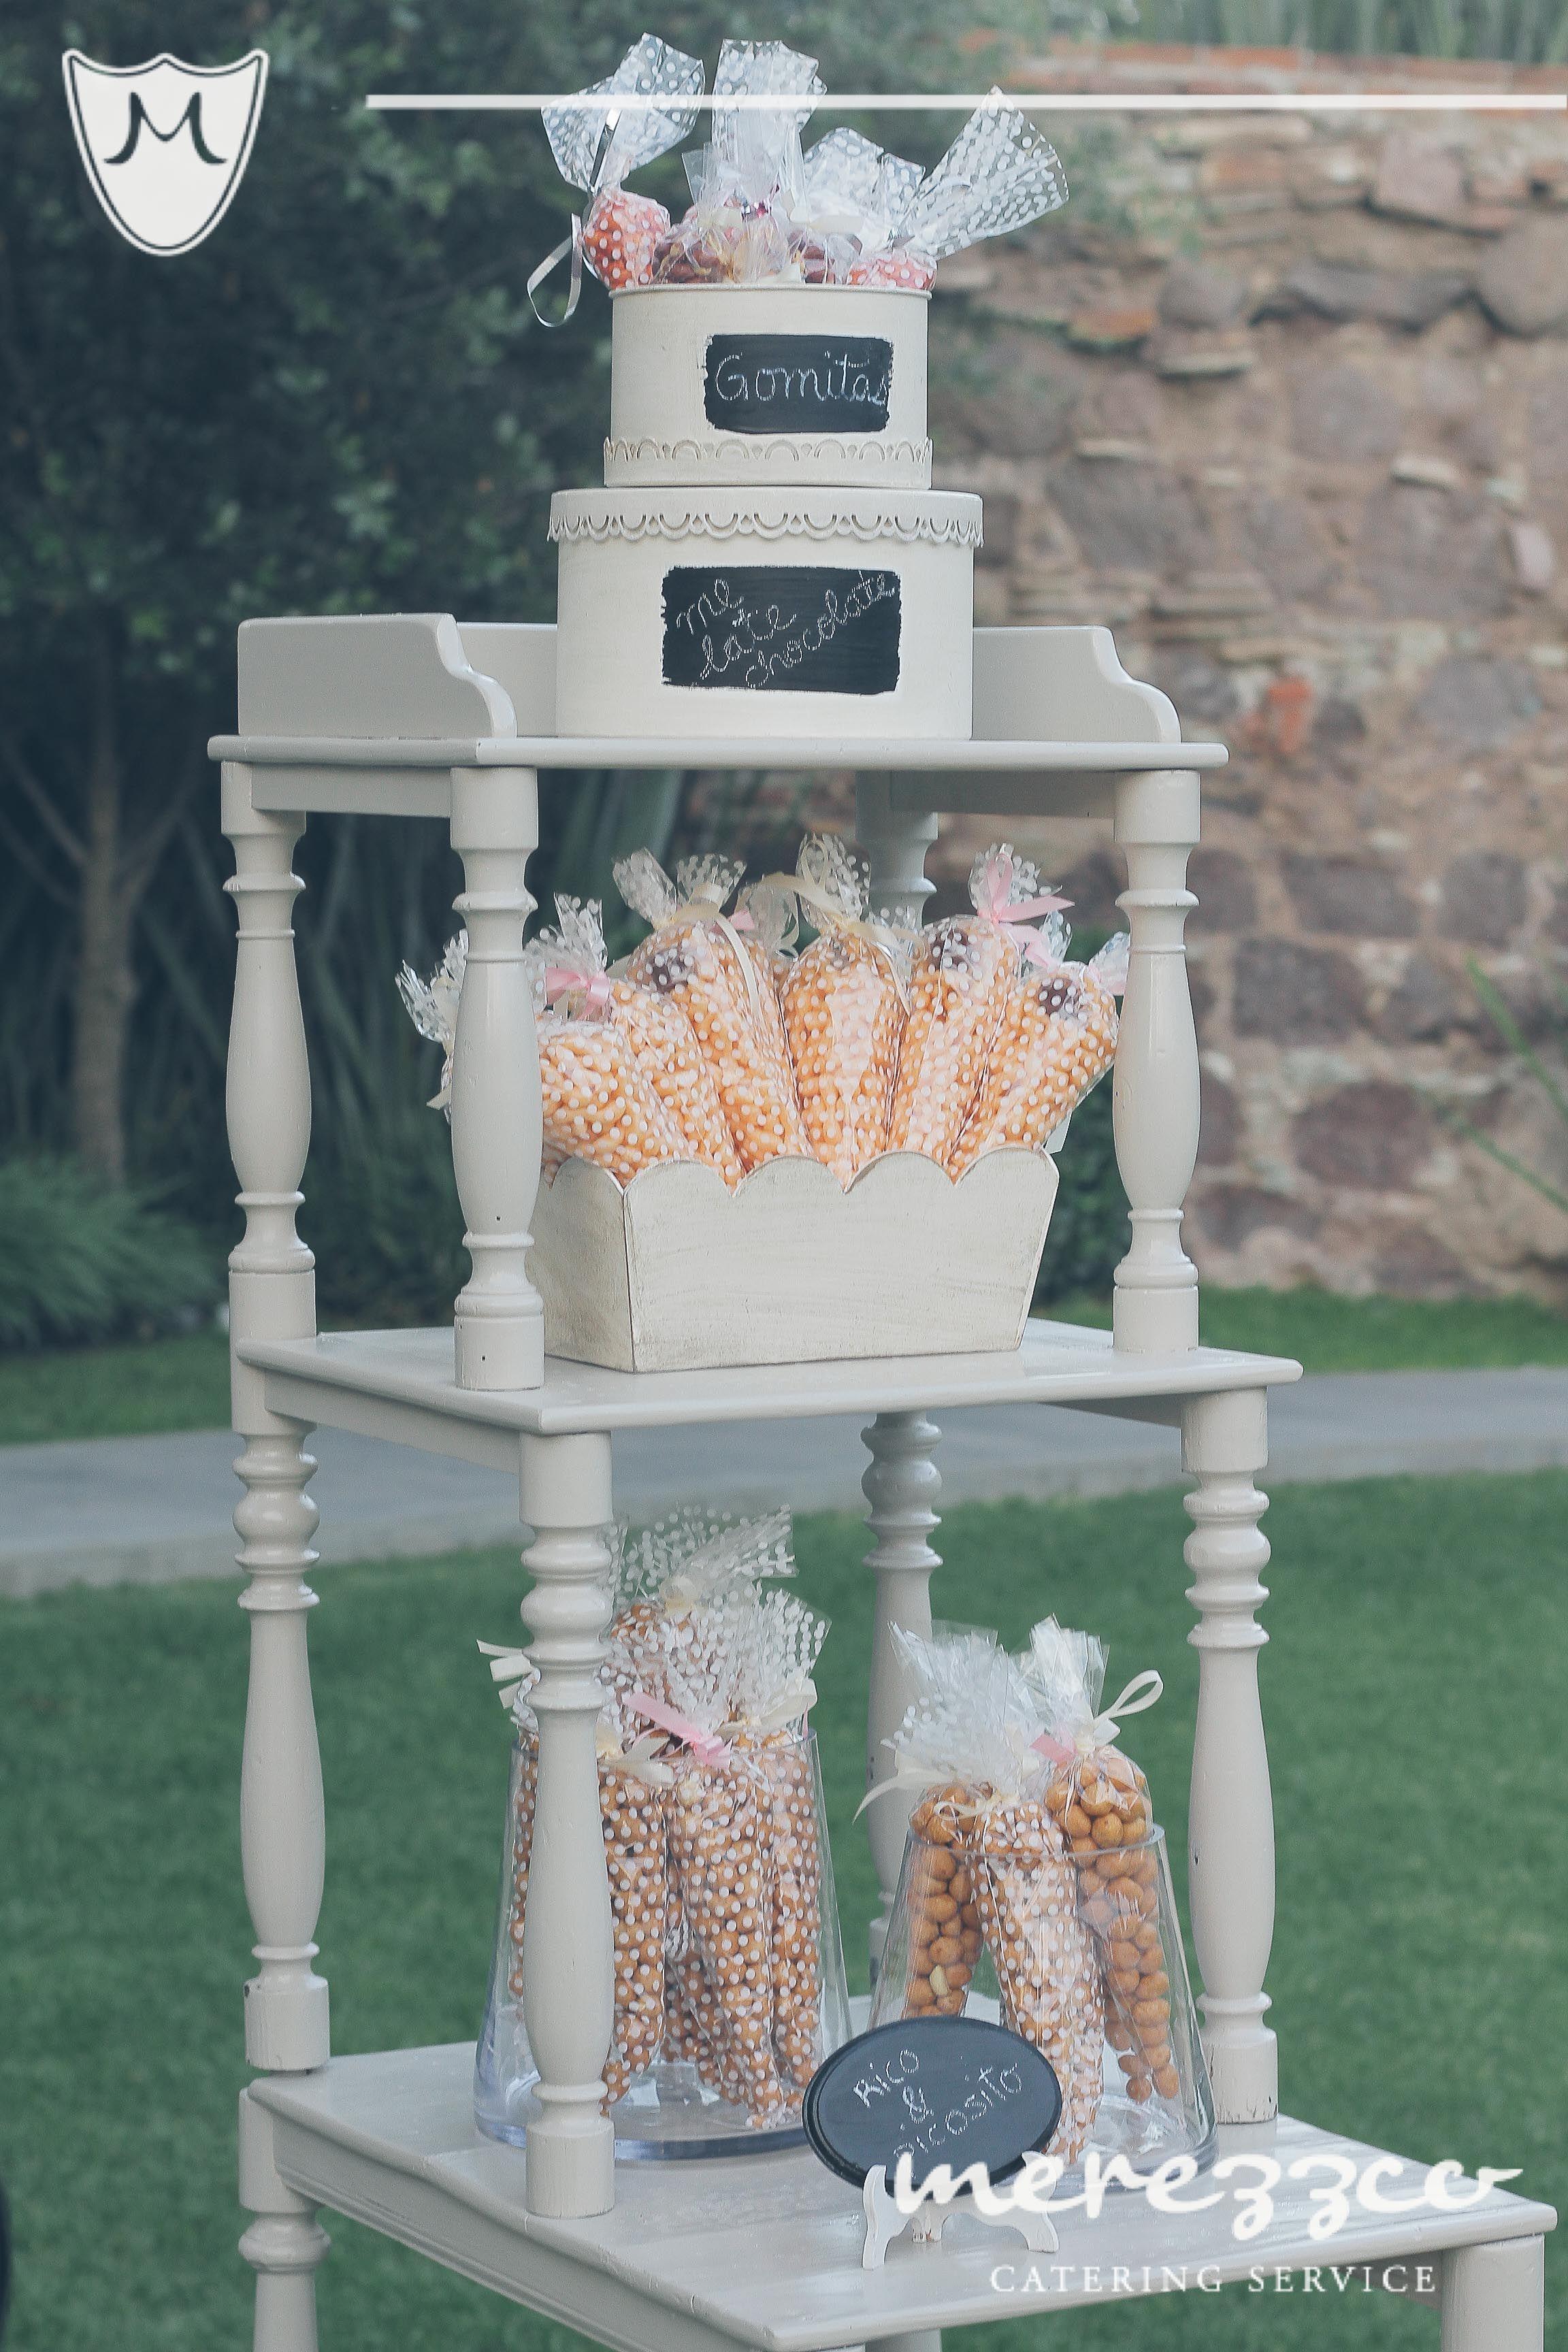 candy station, mesa de dulces, merezzco http://www.merezzco.com/